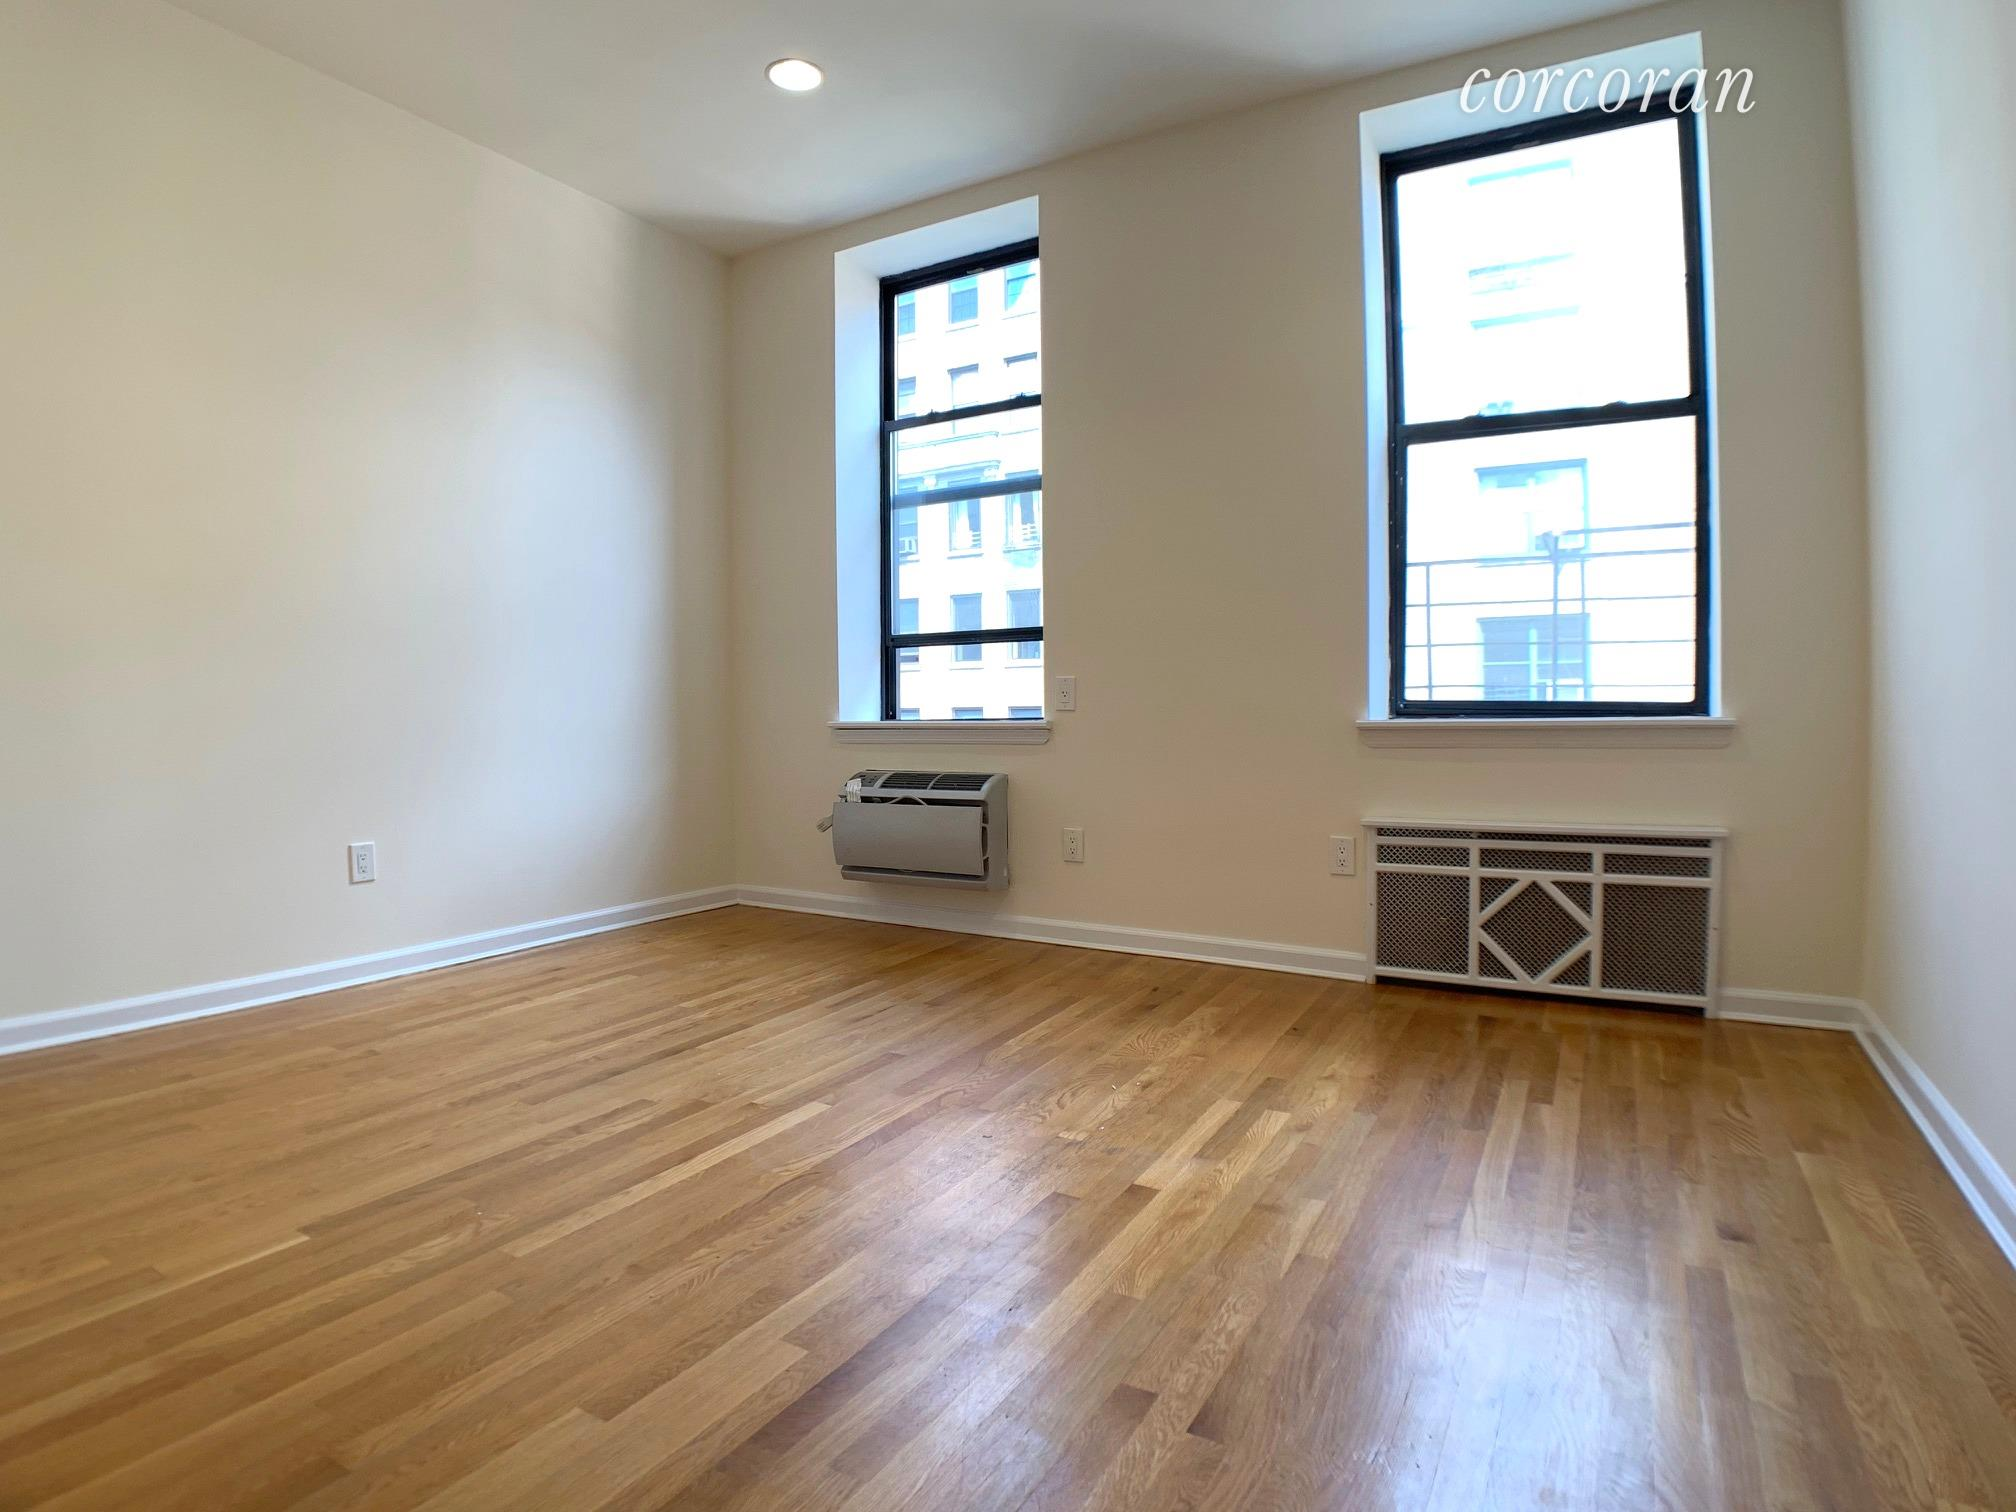 130 East 93rd Street, Apt 6-C, Manhattan, New York 10128